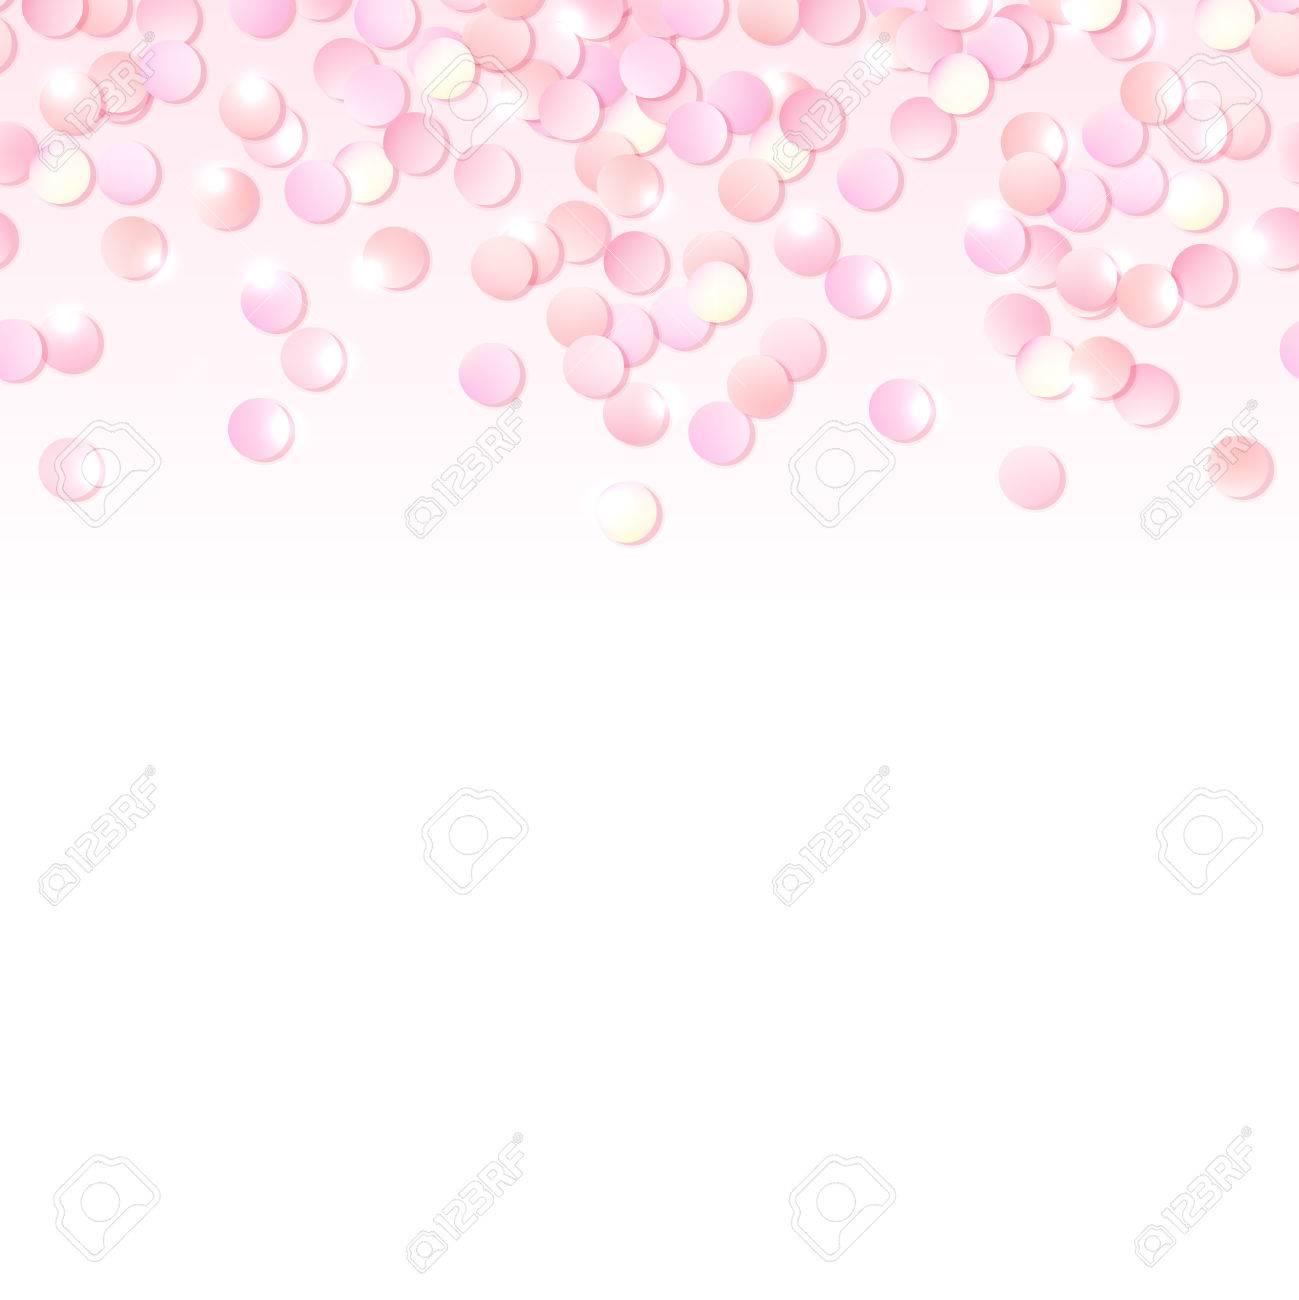 Seamless Border Of Pink Realistic Confetti, Design Template For ...